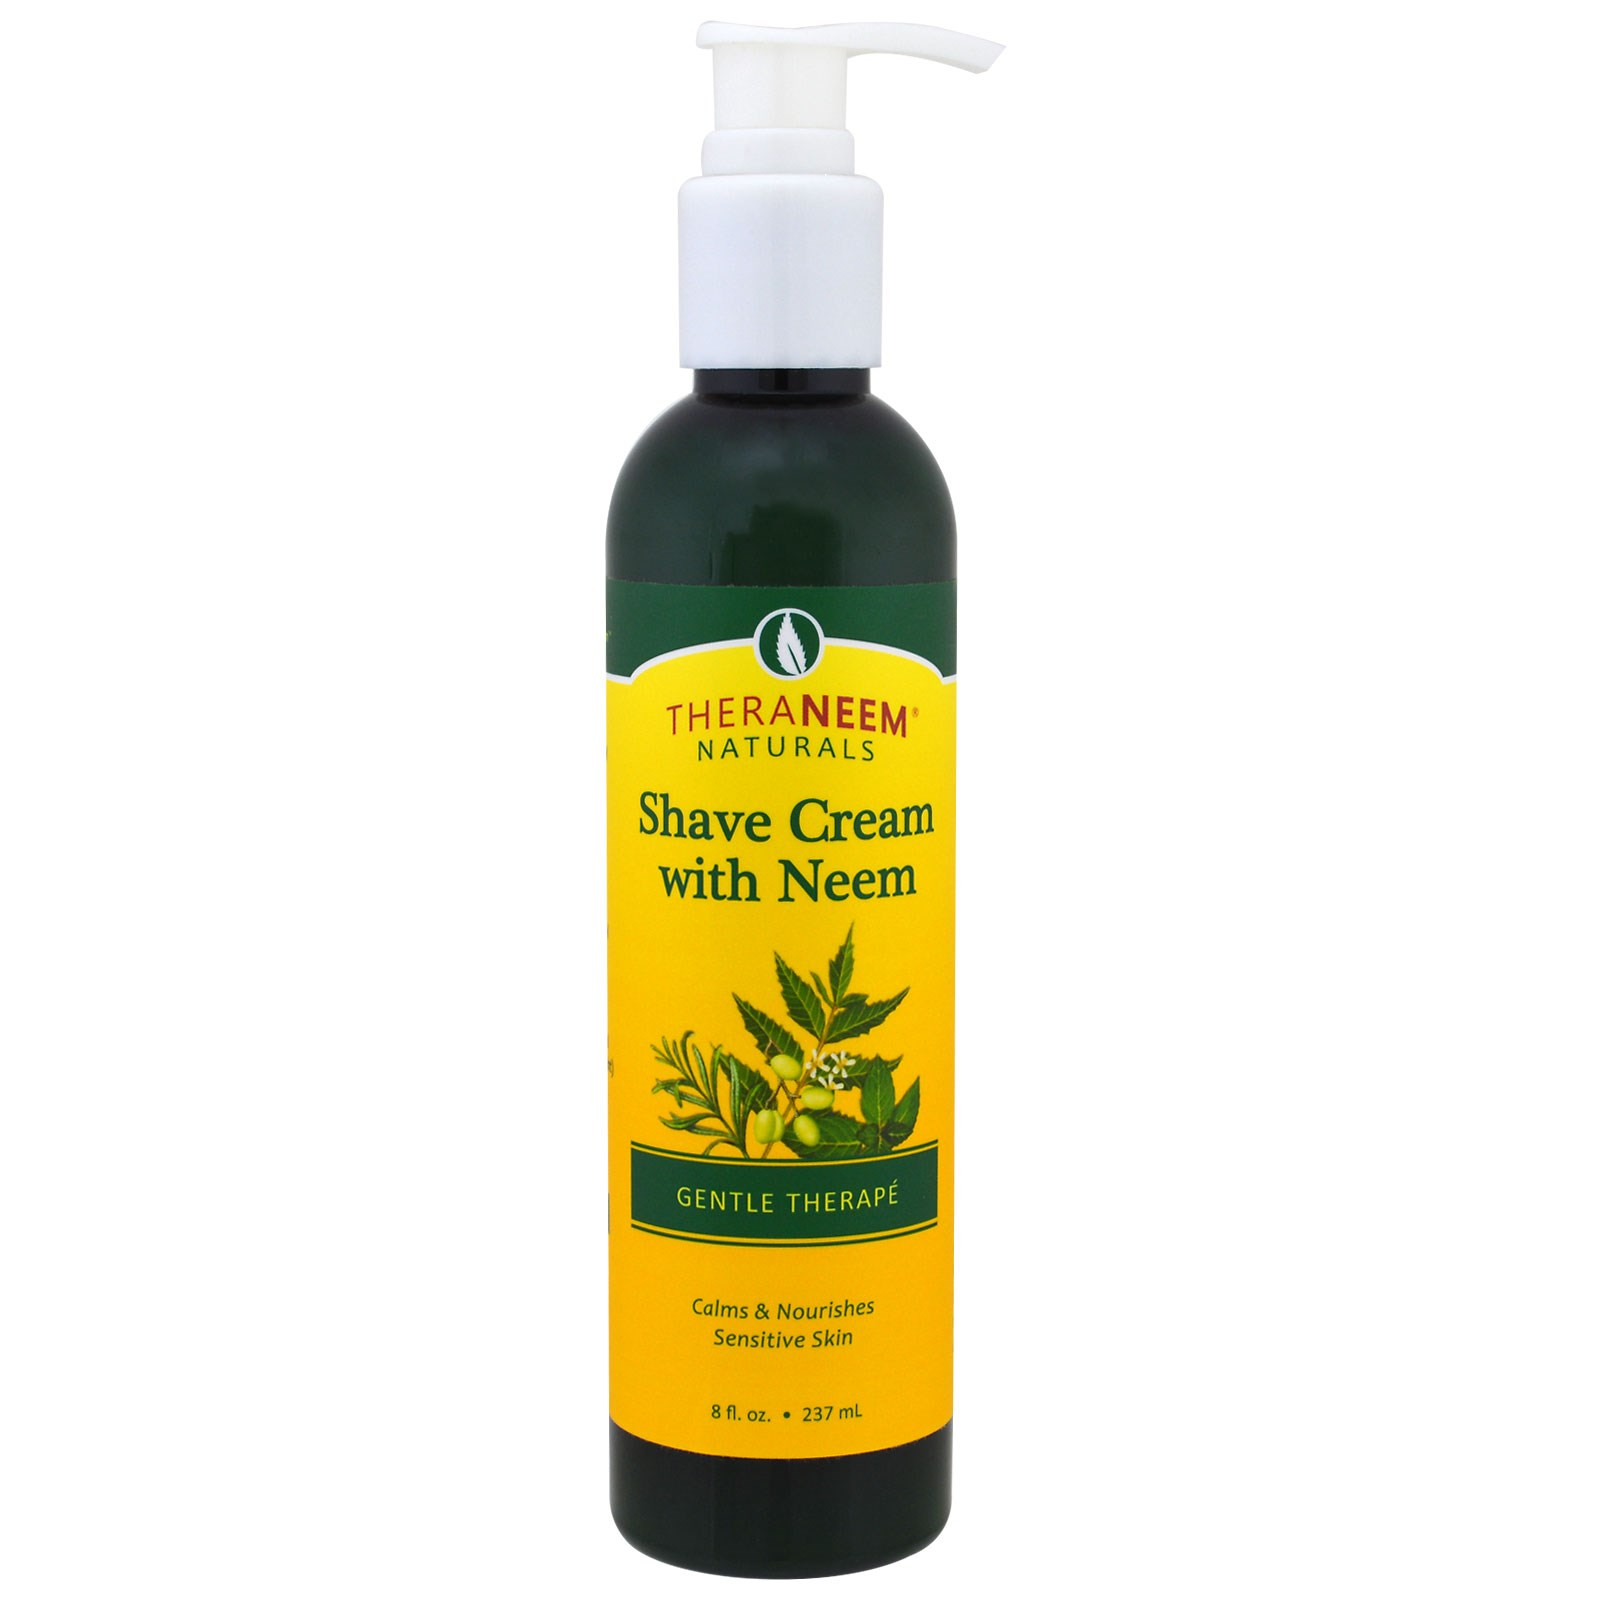 Organix South, TheraNeem Naturals, крем для бриться с маслом дерева ним, мягкий уход, 237 мл (8 жидких унций)